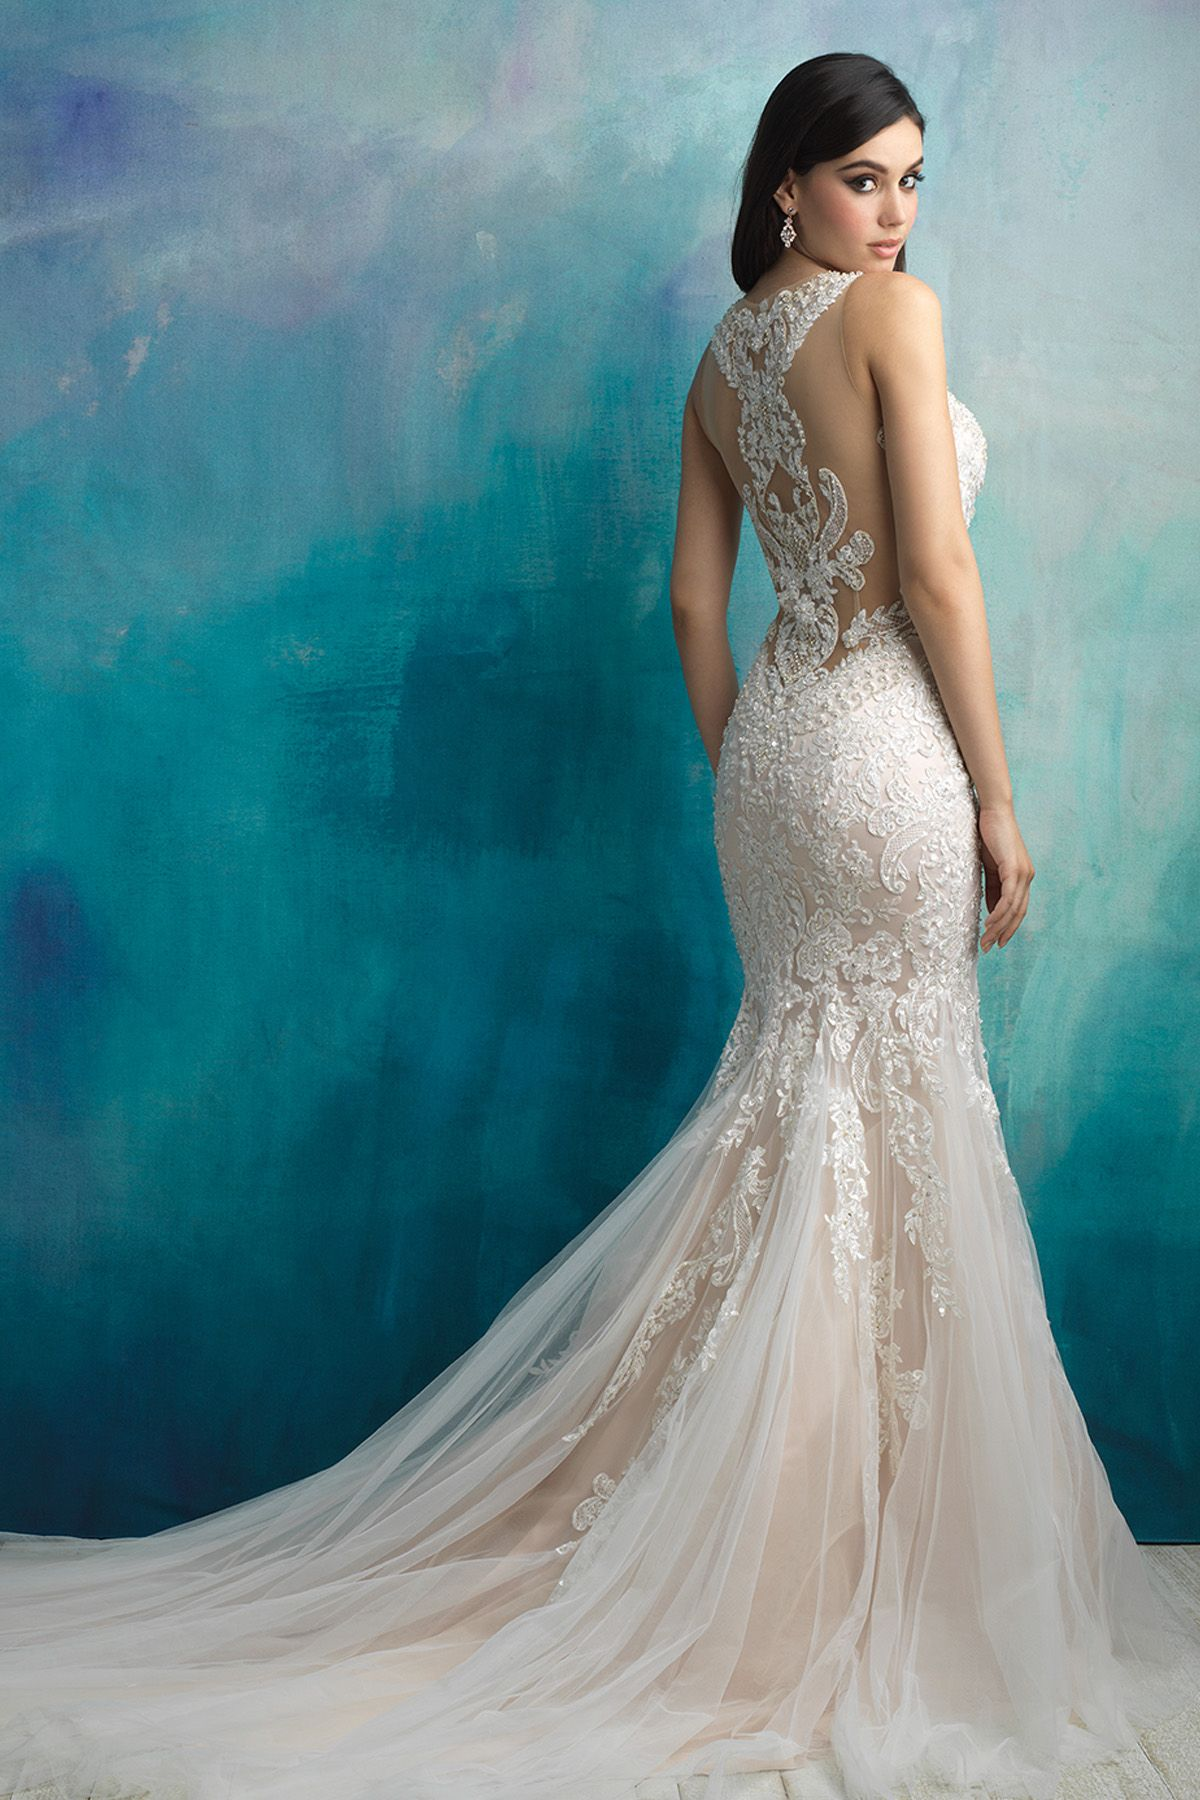 07b4d04dbe008 Allure 9511 is fantastic at Angelique's Bridal! #angelbride  #yourdressishere angeliquesbridal.com/